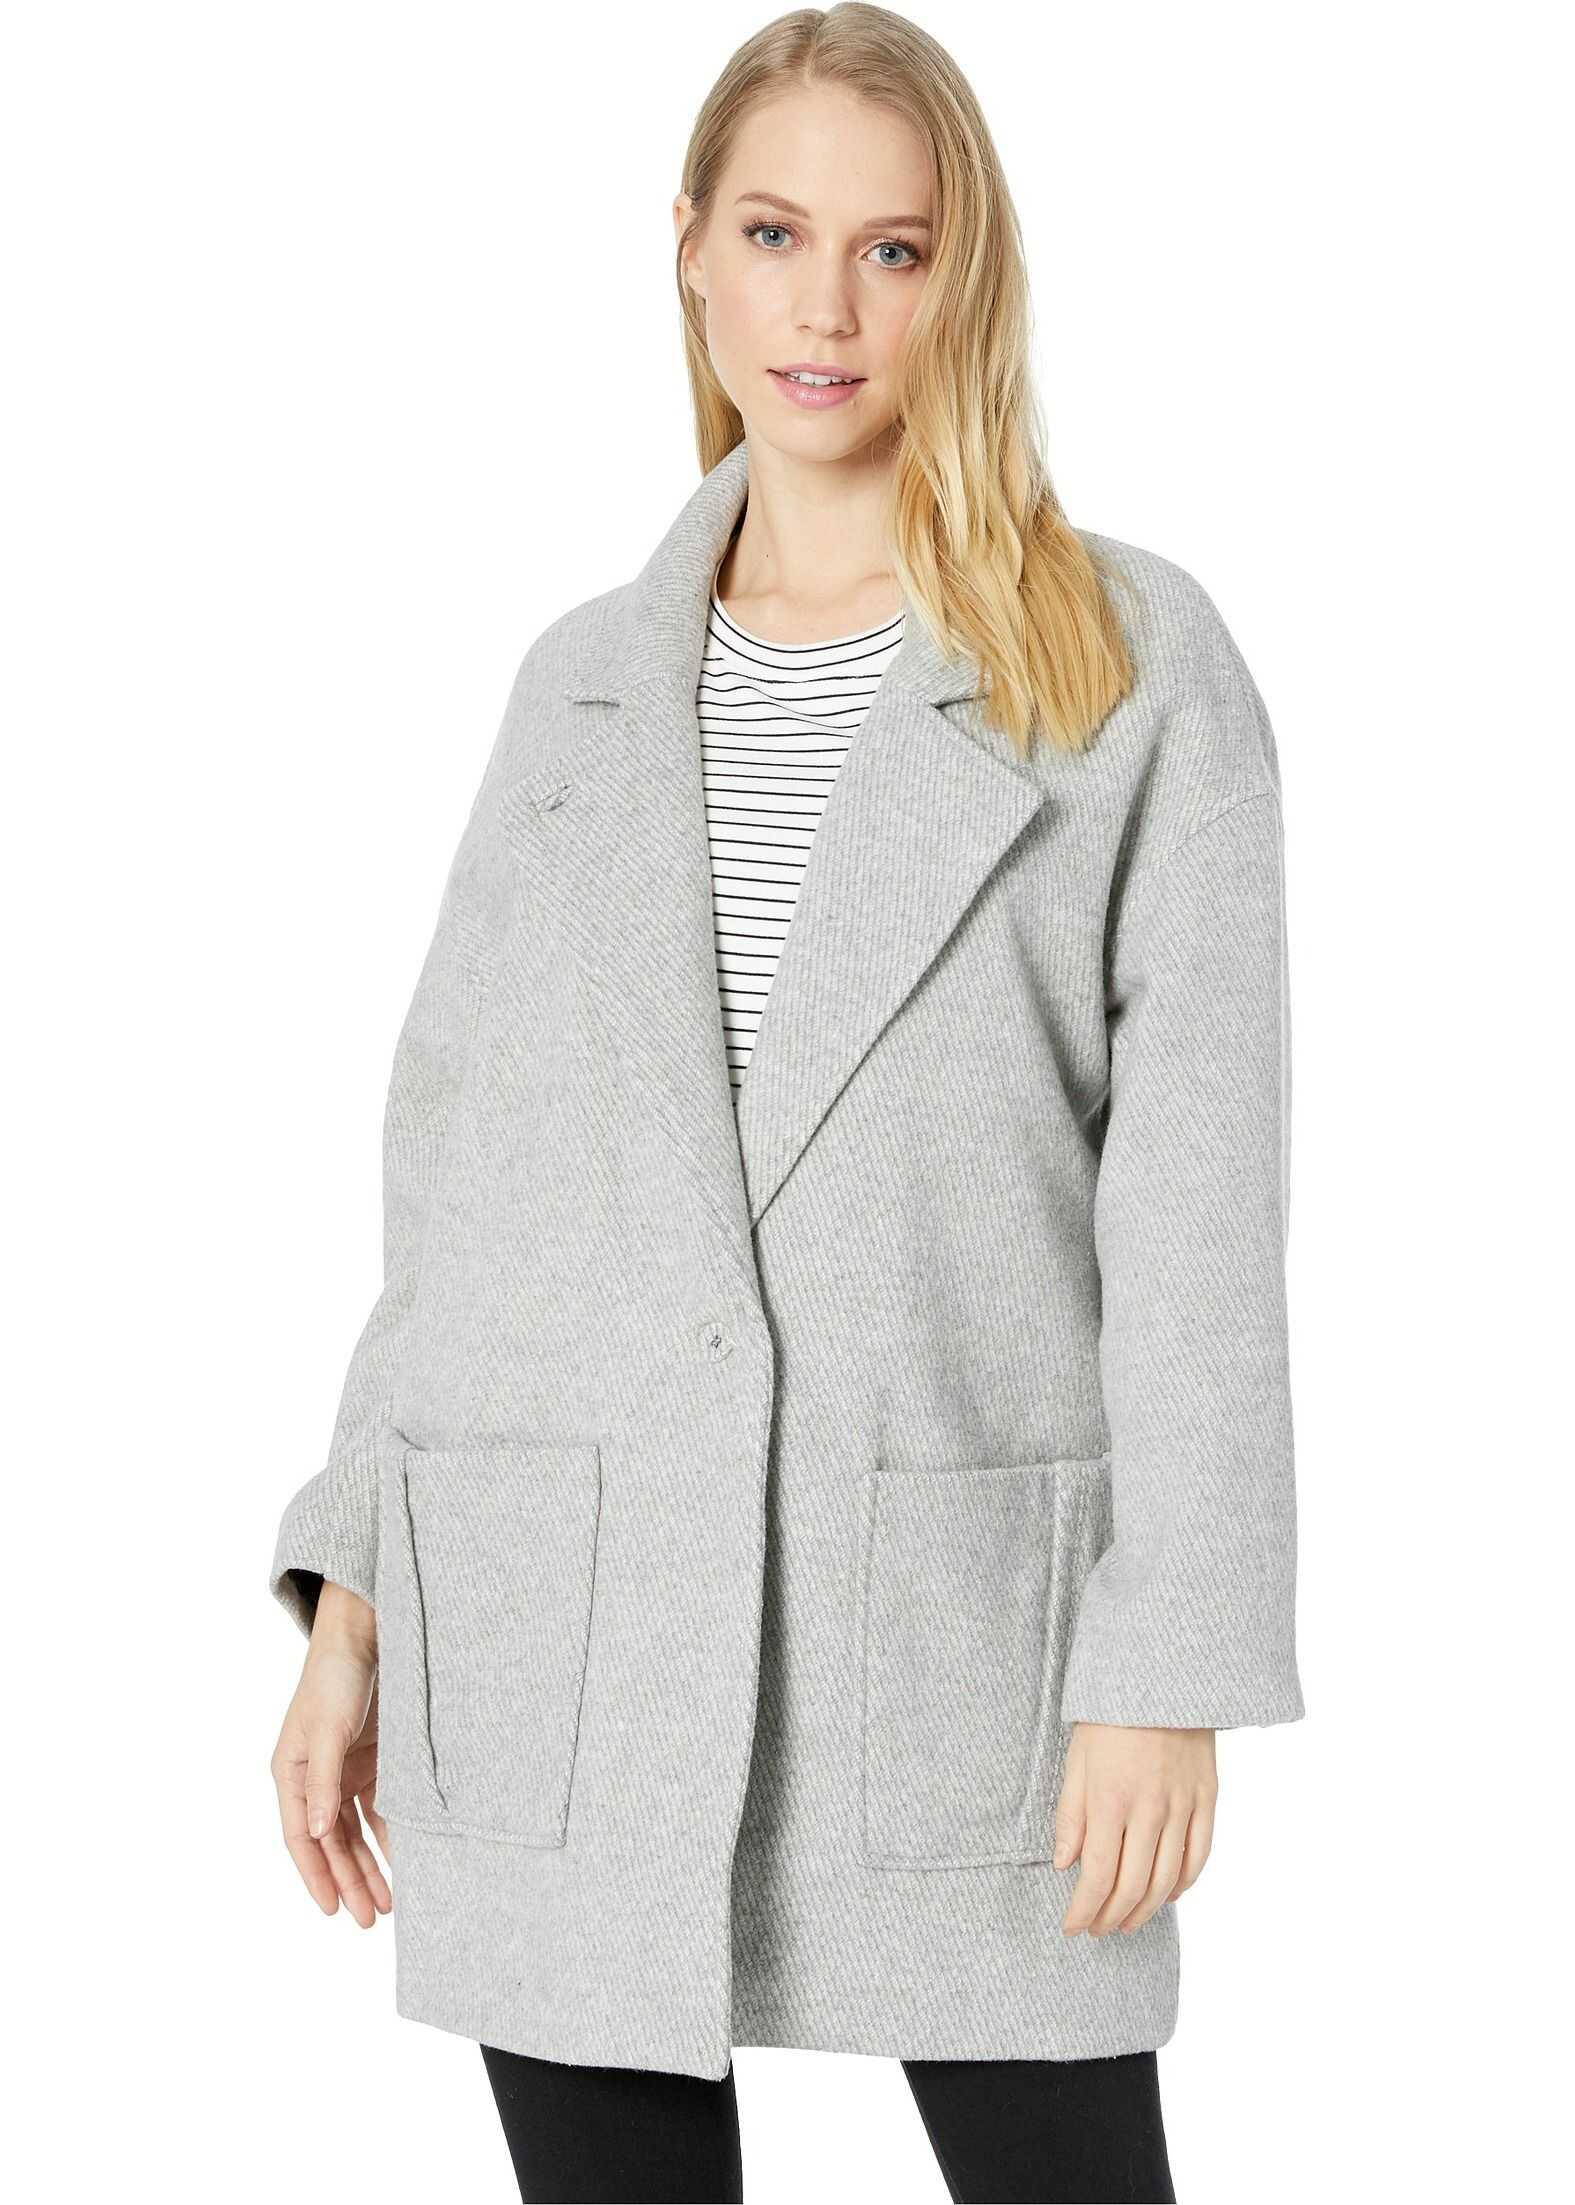 Volcom Volcoon Coat Heather Grey